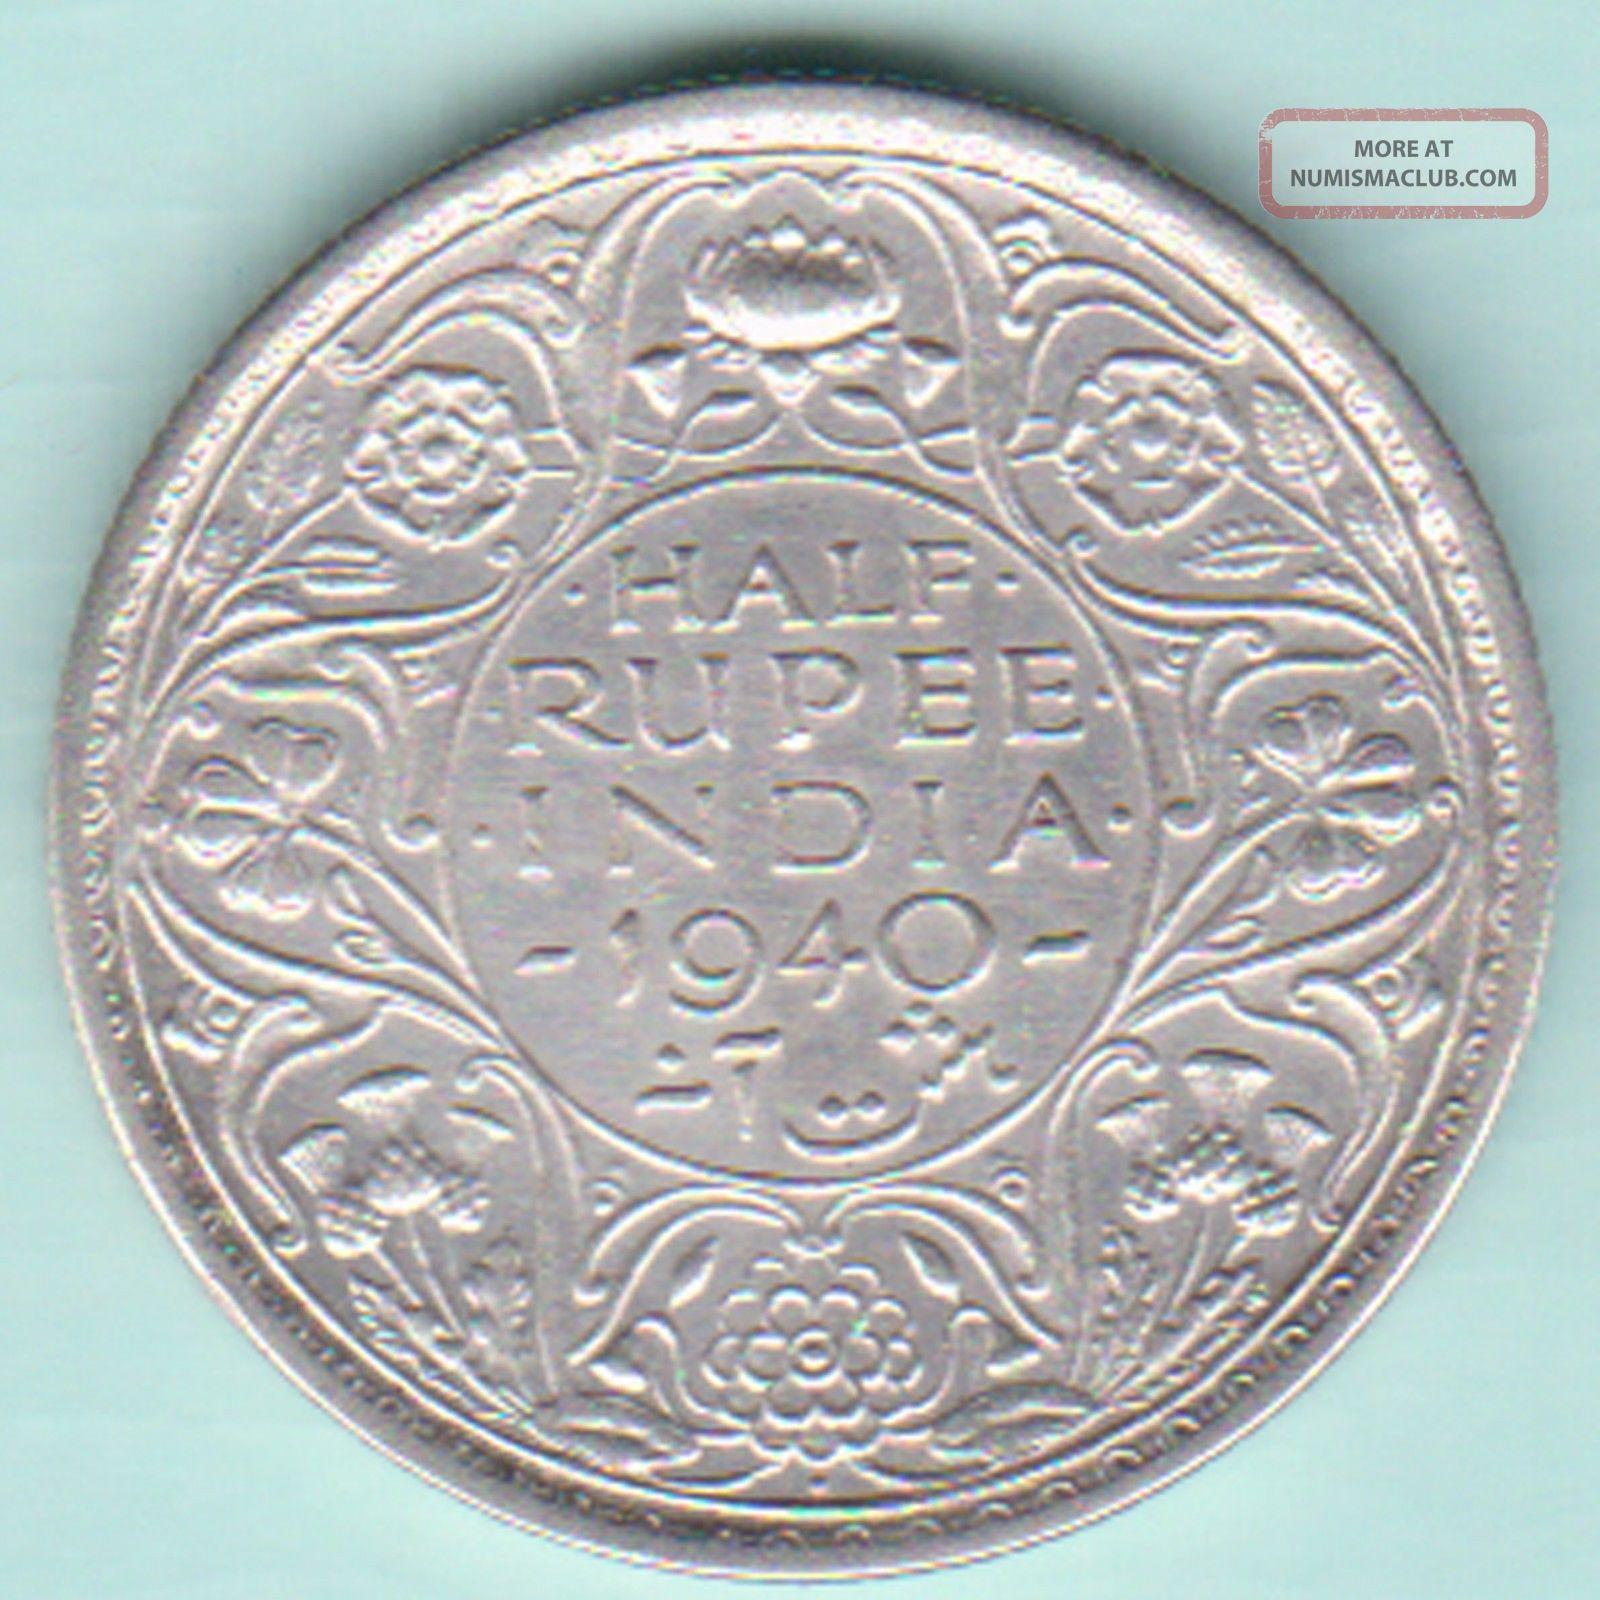 British India - 1940 - King George Vi Emperor - Half Rupee - Rarest Silver Coin British photo